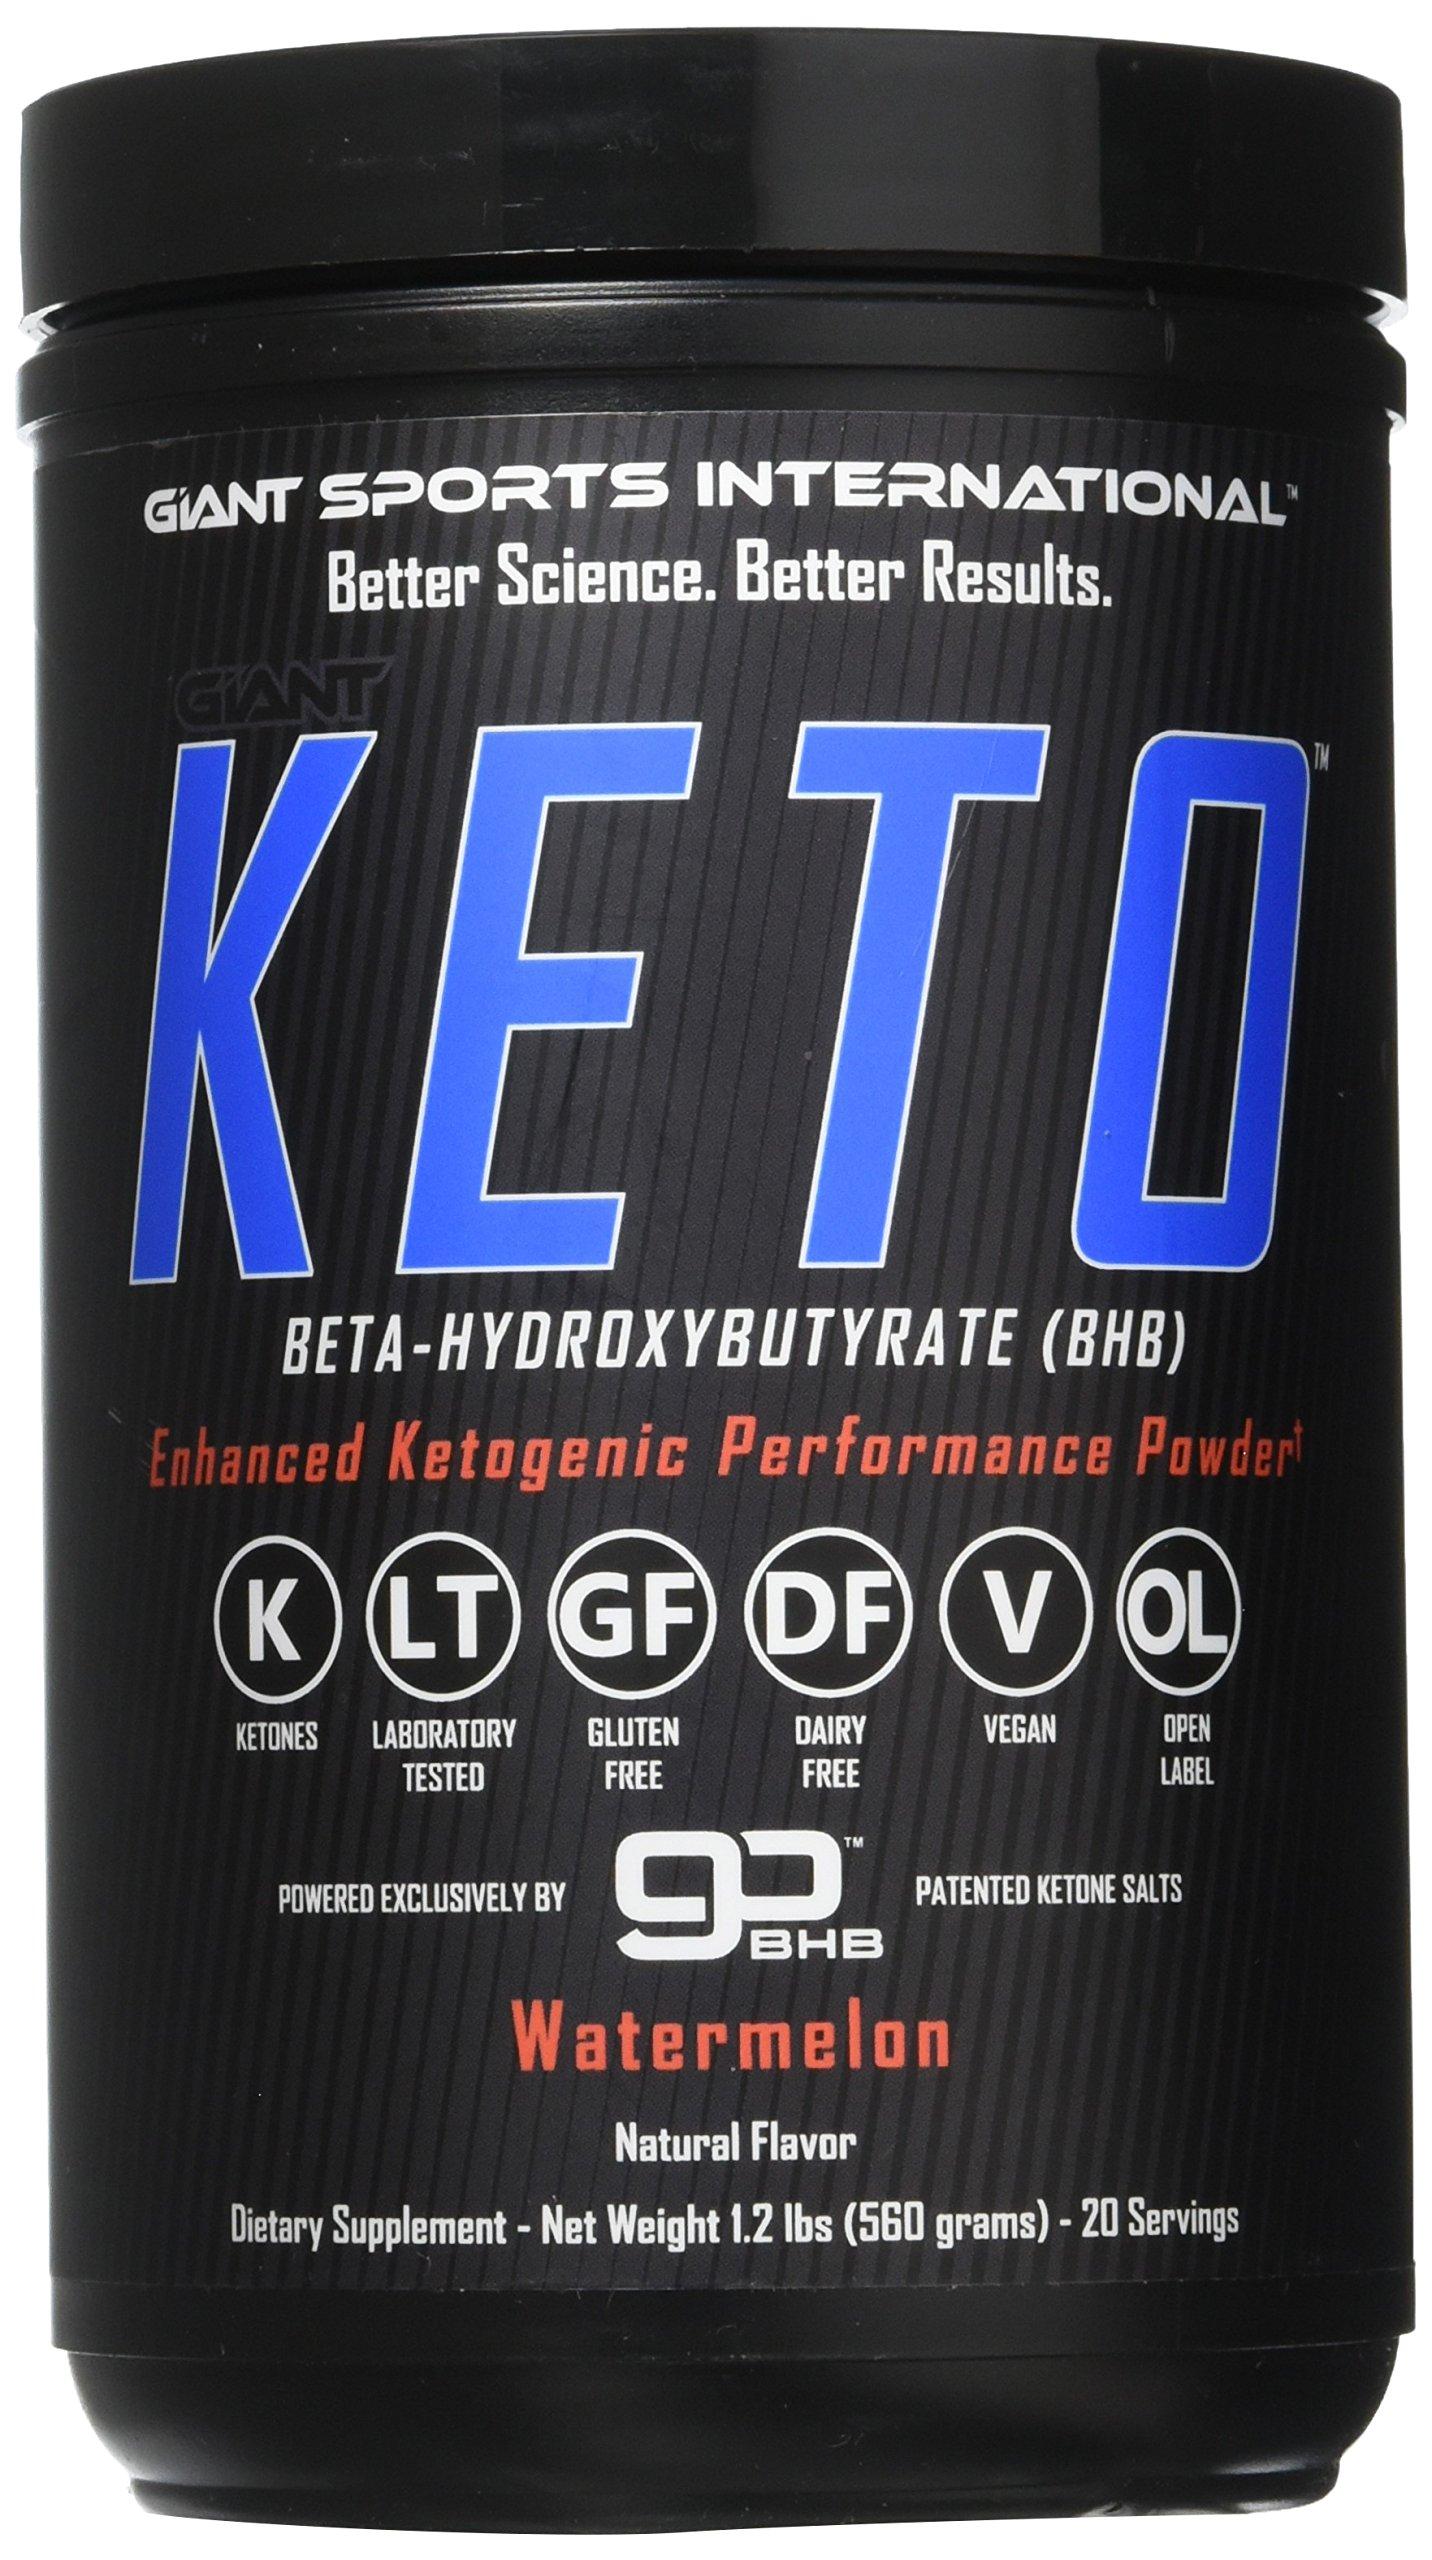 Amazon.com: Giant Keto-Exogenous Ketones Supplement - Beta-Hydroxybutyrate Keto Powder Designed ...